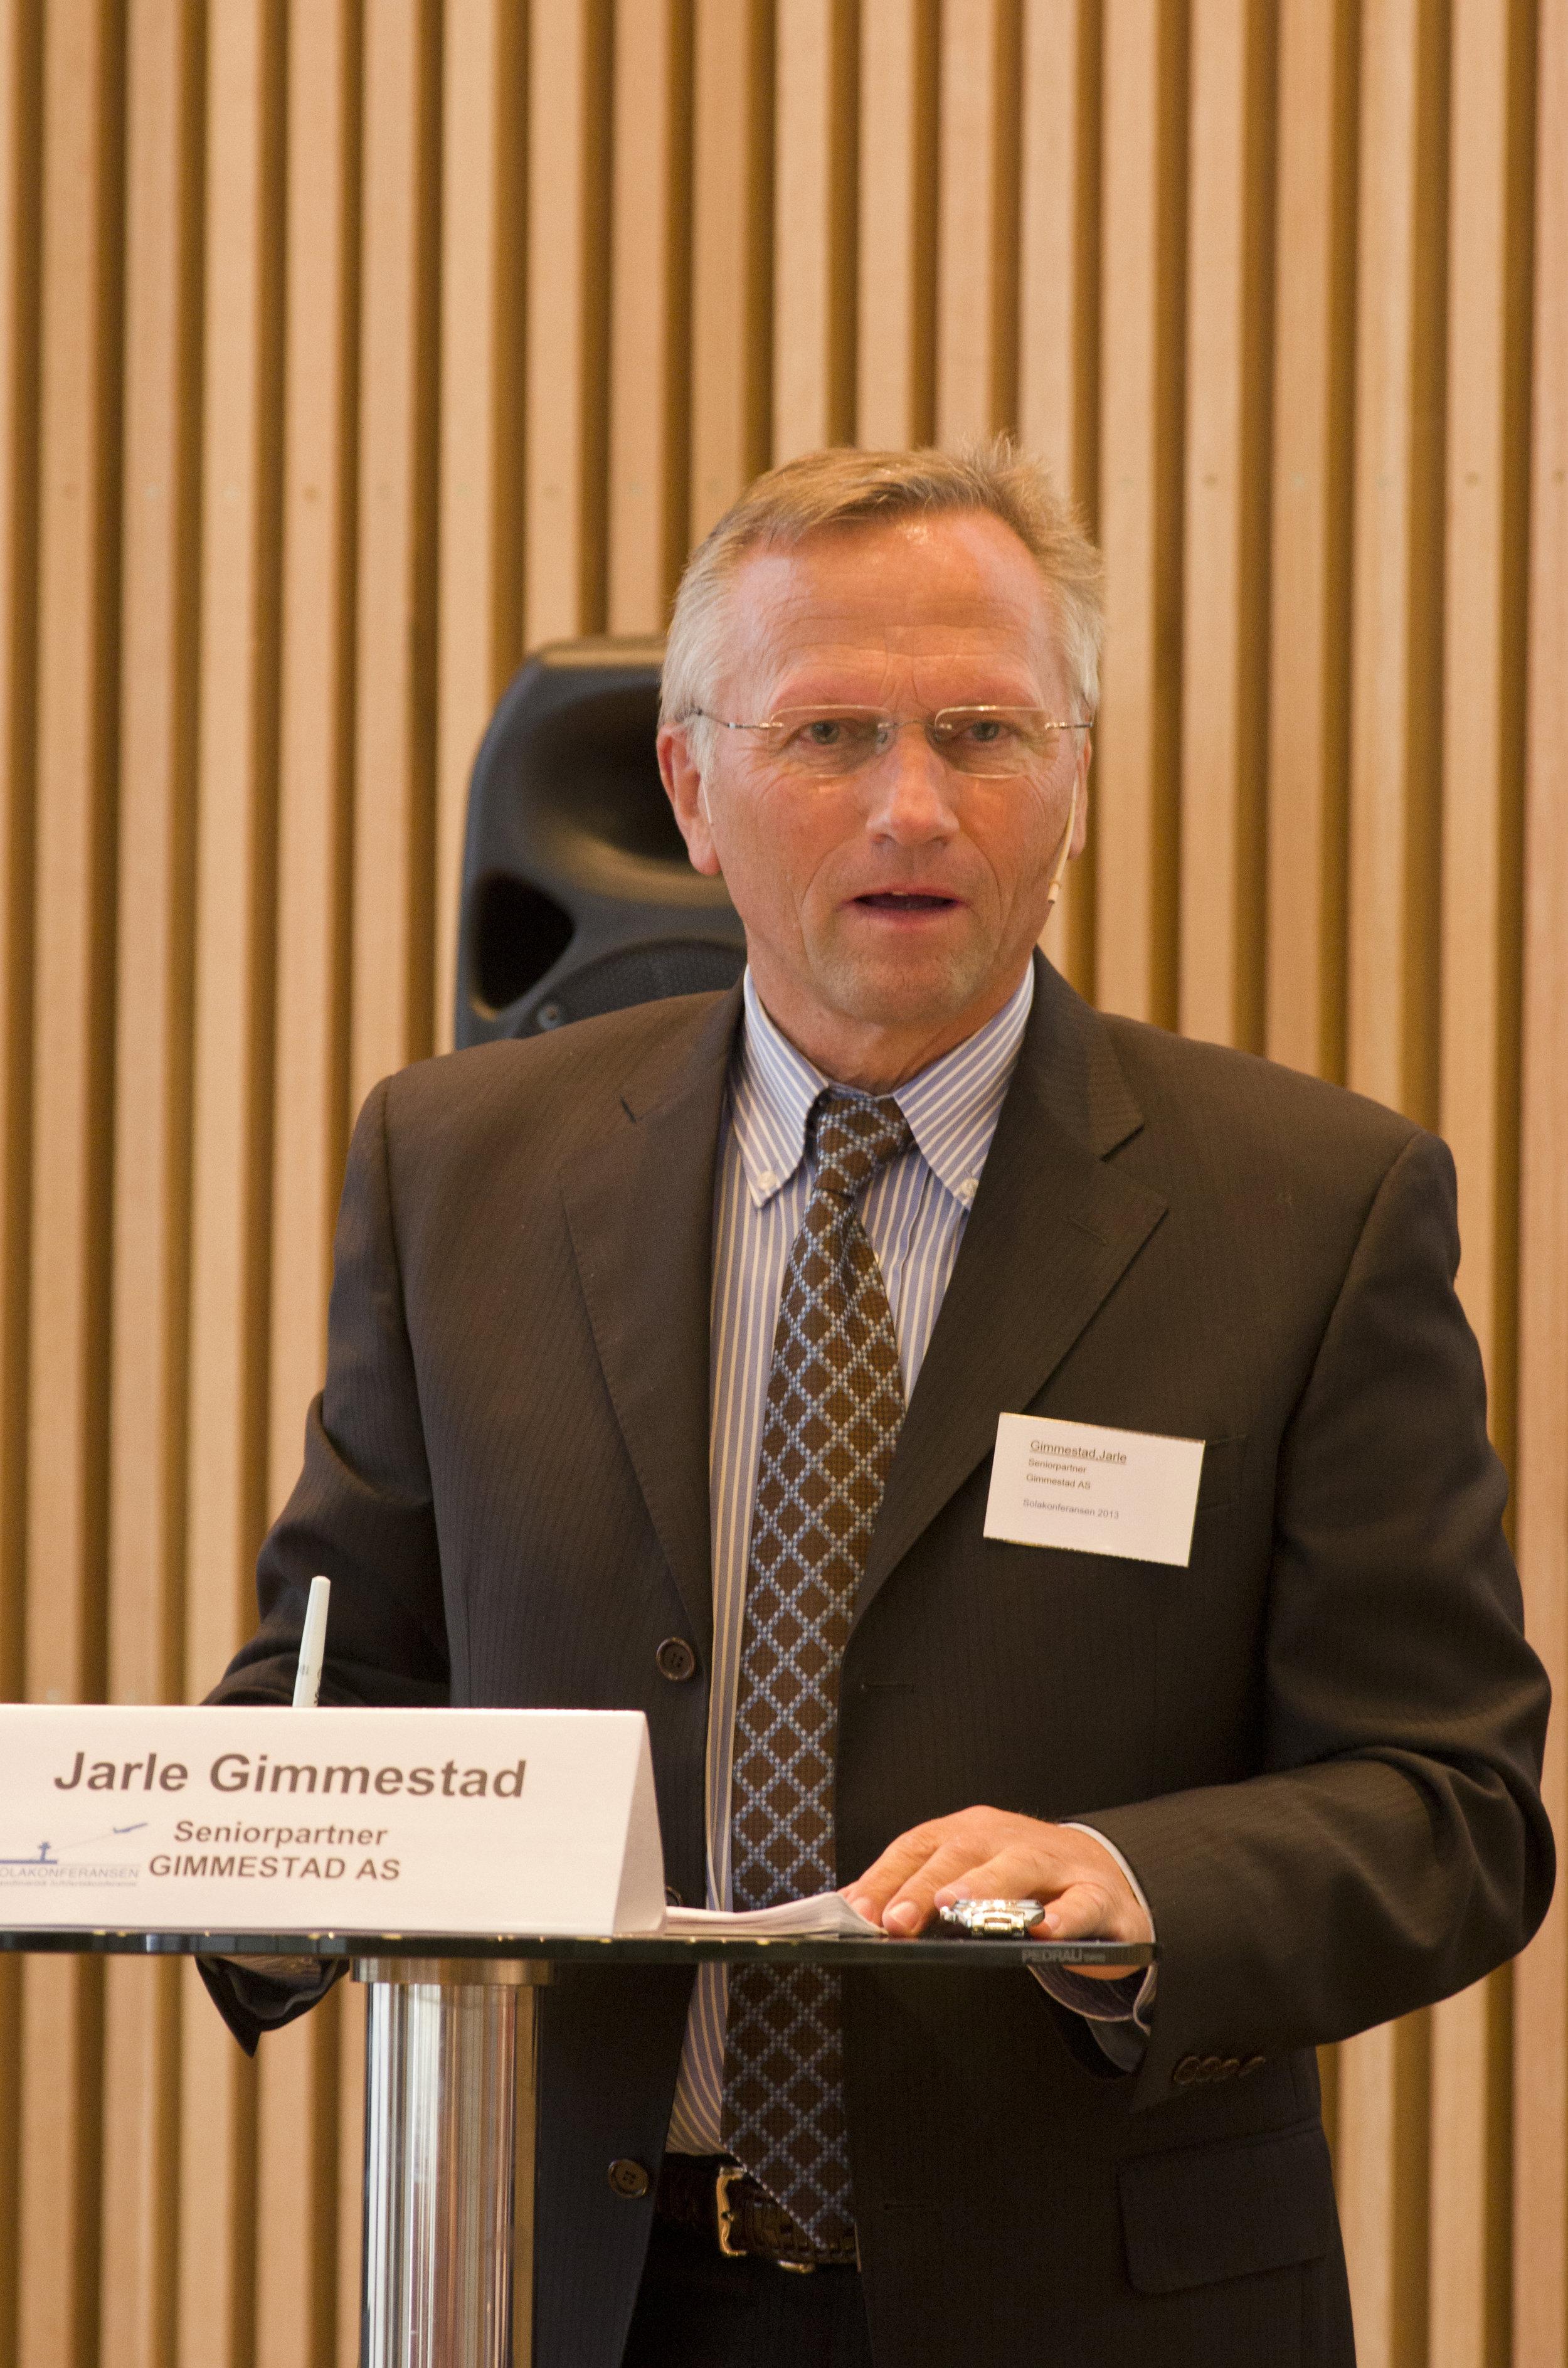 Jarle Gimmestad (2).JPG